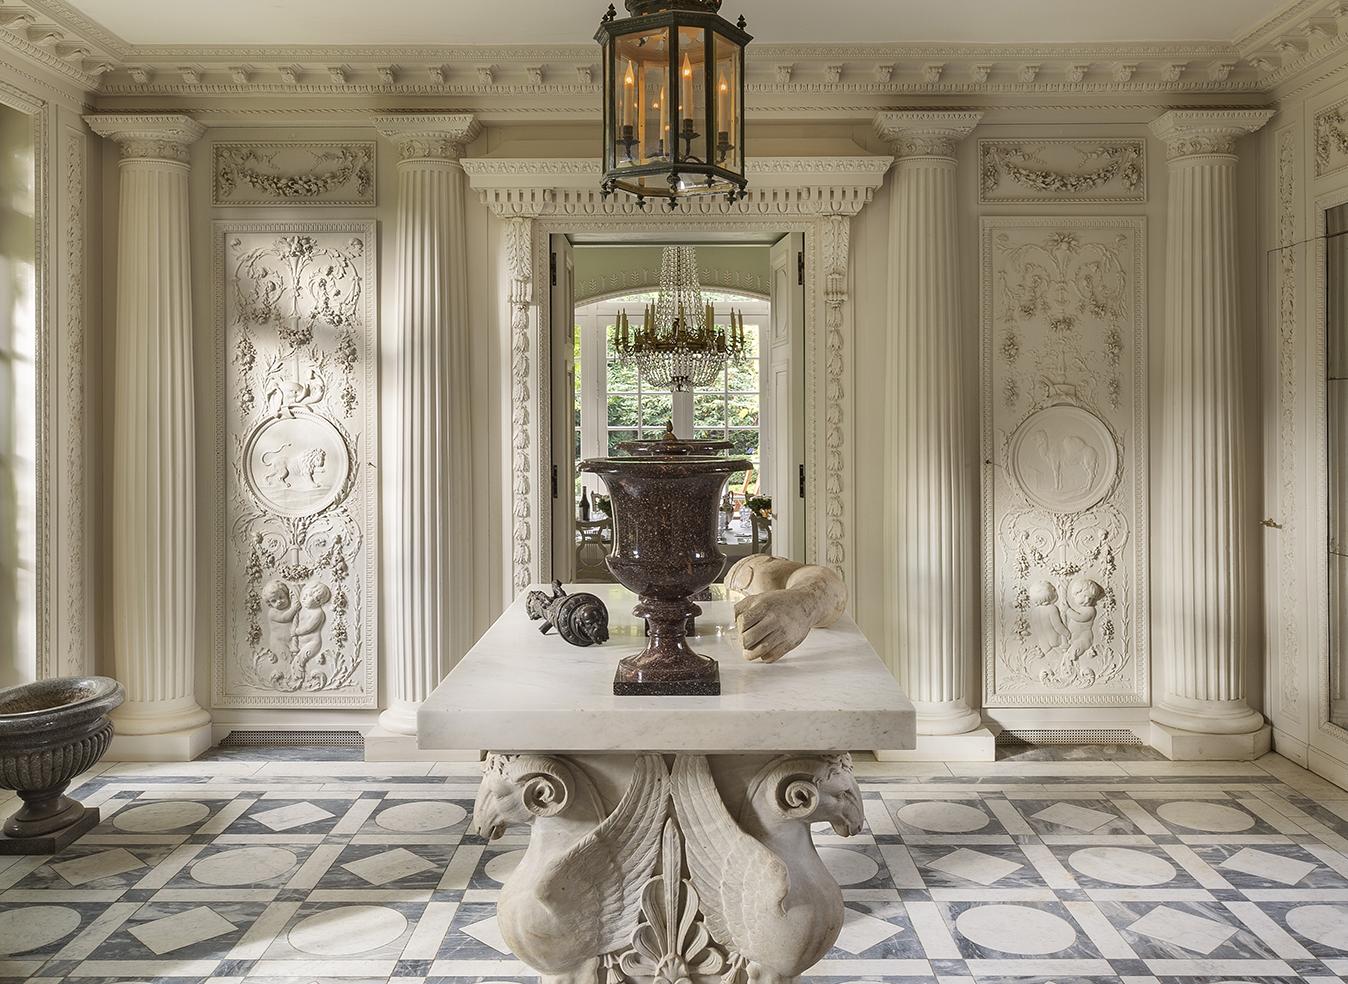 Neoclassical style wall paneling, Ledoux inspiration